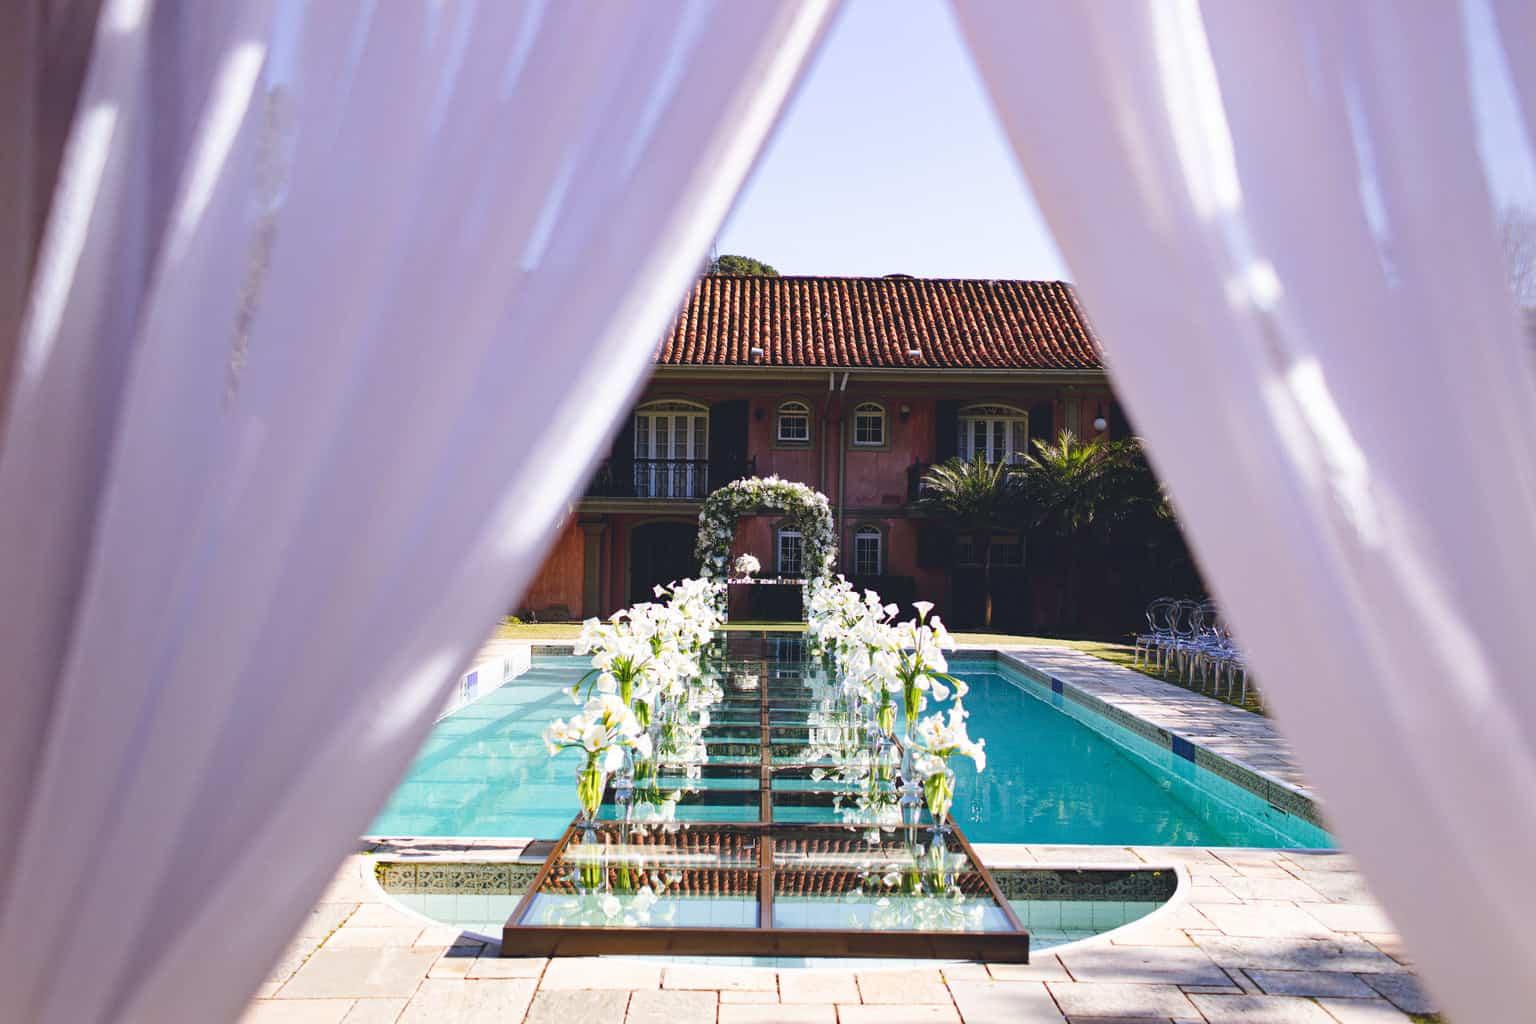 Casamento-de-Bianka-e-Nilo-Fotografia-Marcelo-Schmoeller-SC-Alameda-Casa-Rosa-03082019_bianka-e-nilo_0642